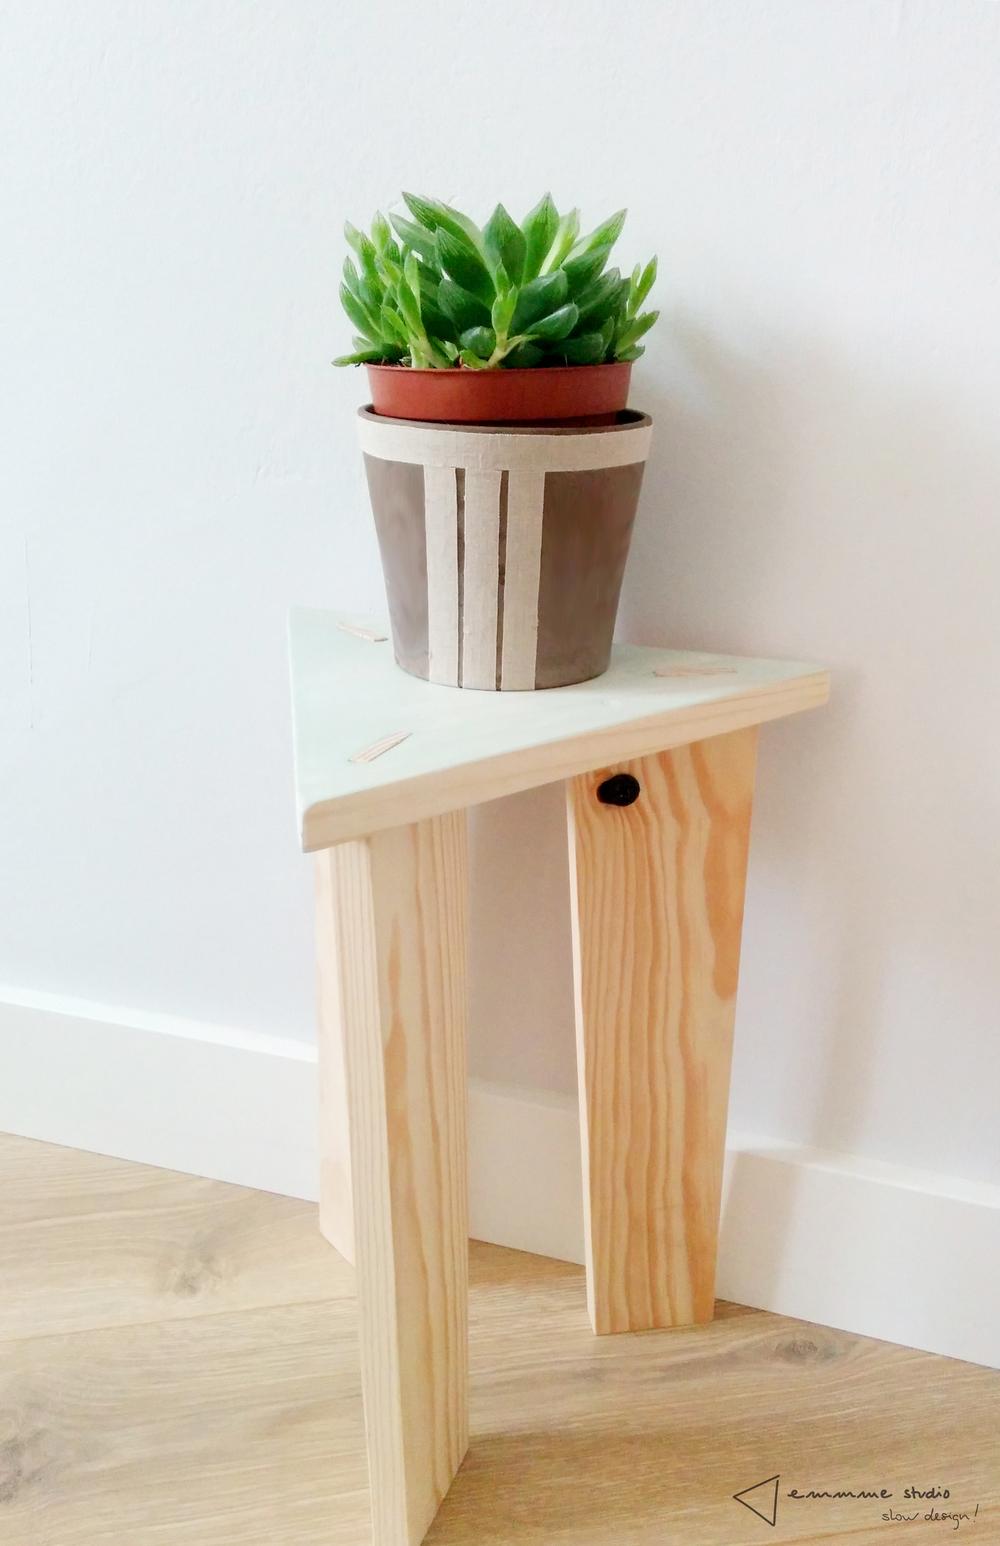 Mesa-taburete Deleite Design. Fotografía emmme studio.